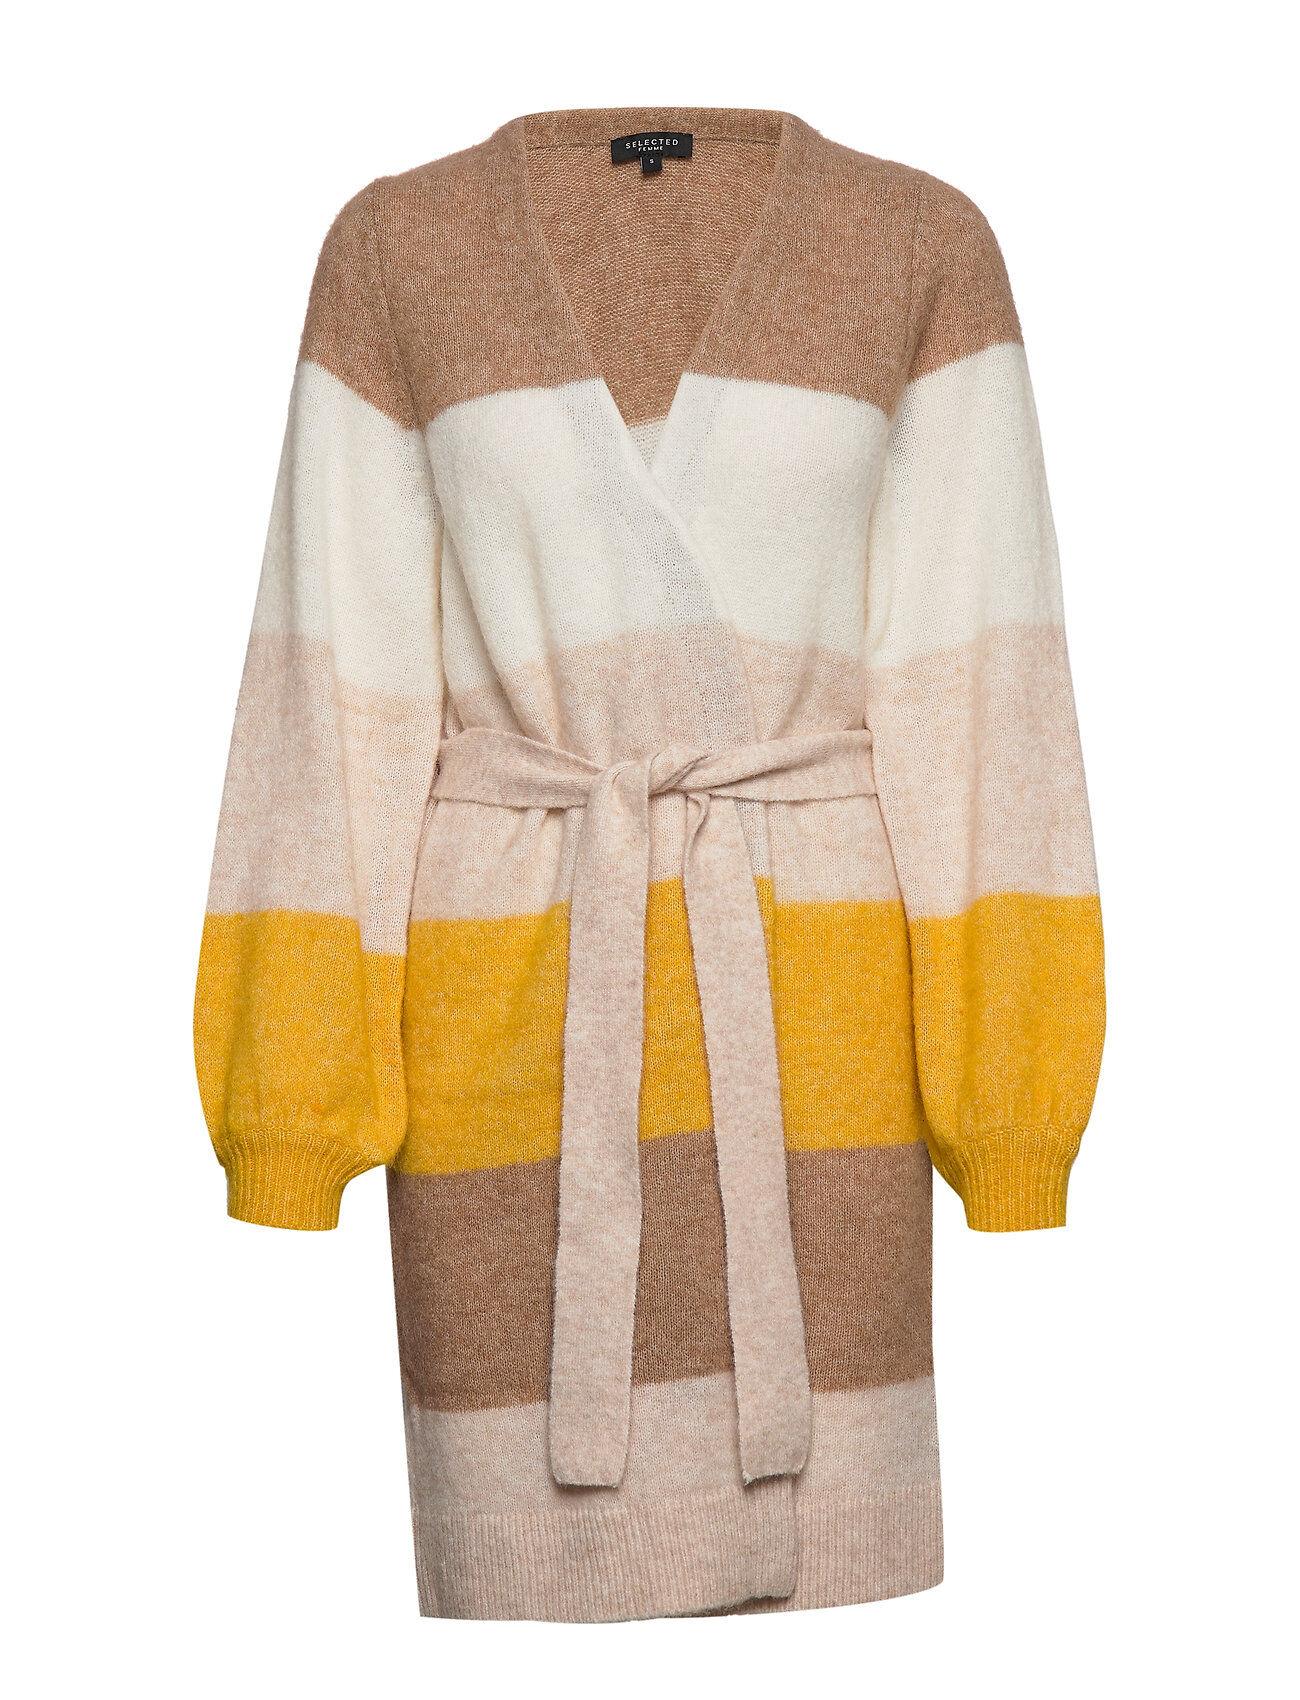 Selected Femme Slfanna Ls X-Mas Knit Cardigan B Neuletakki Keltainen Selected Femme